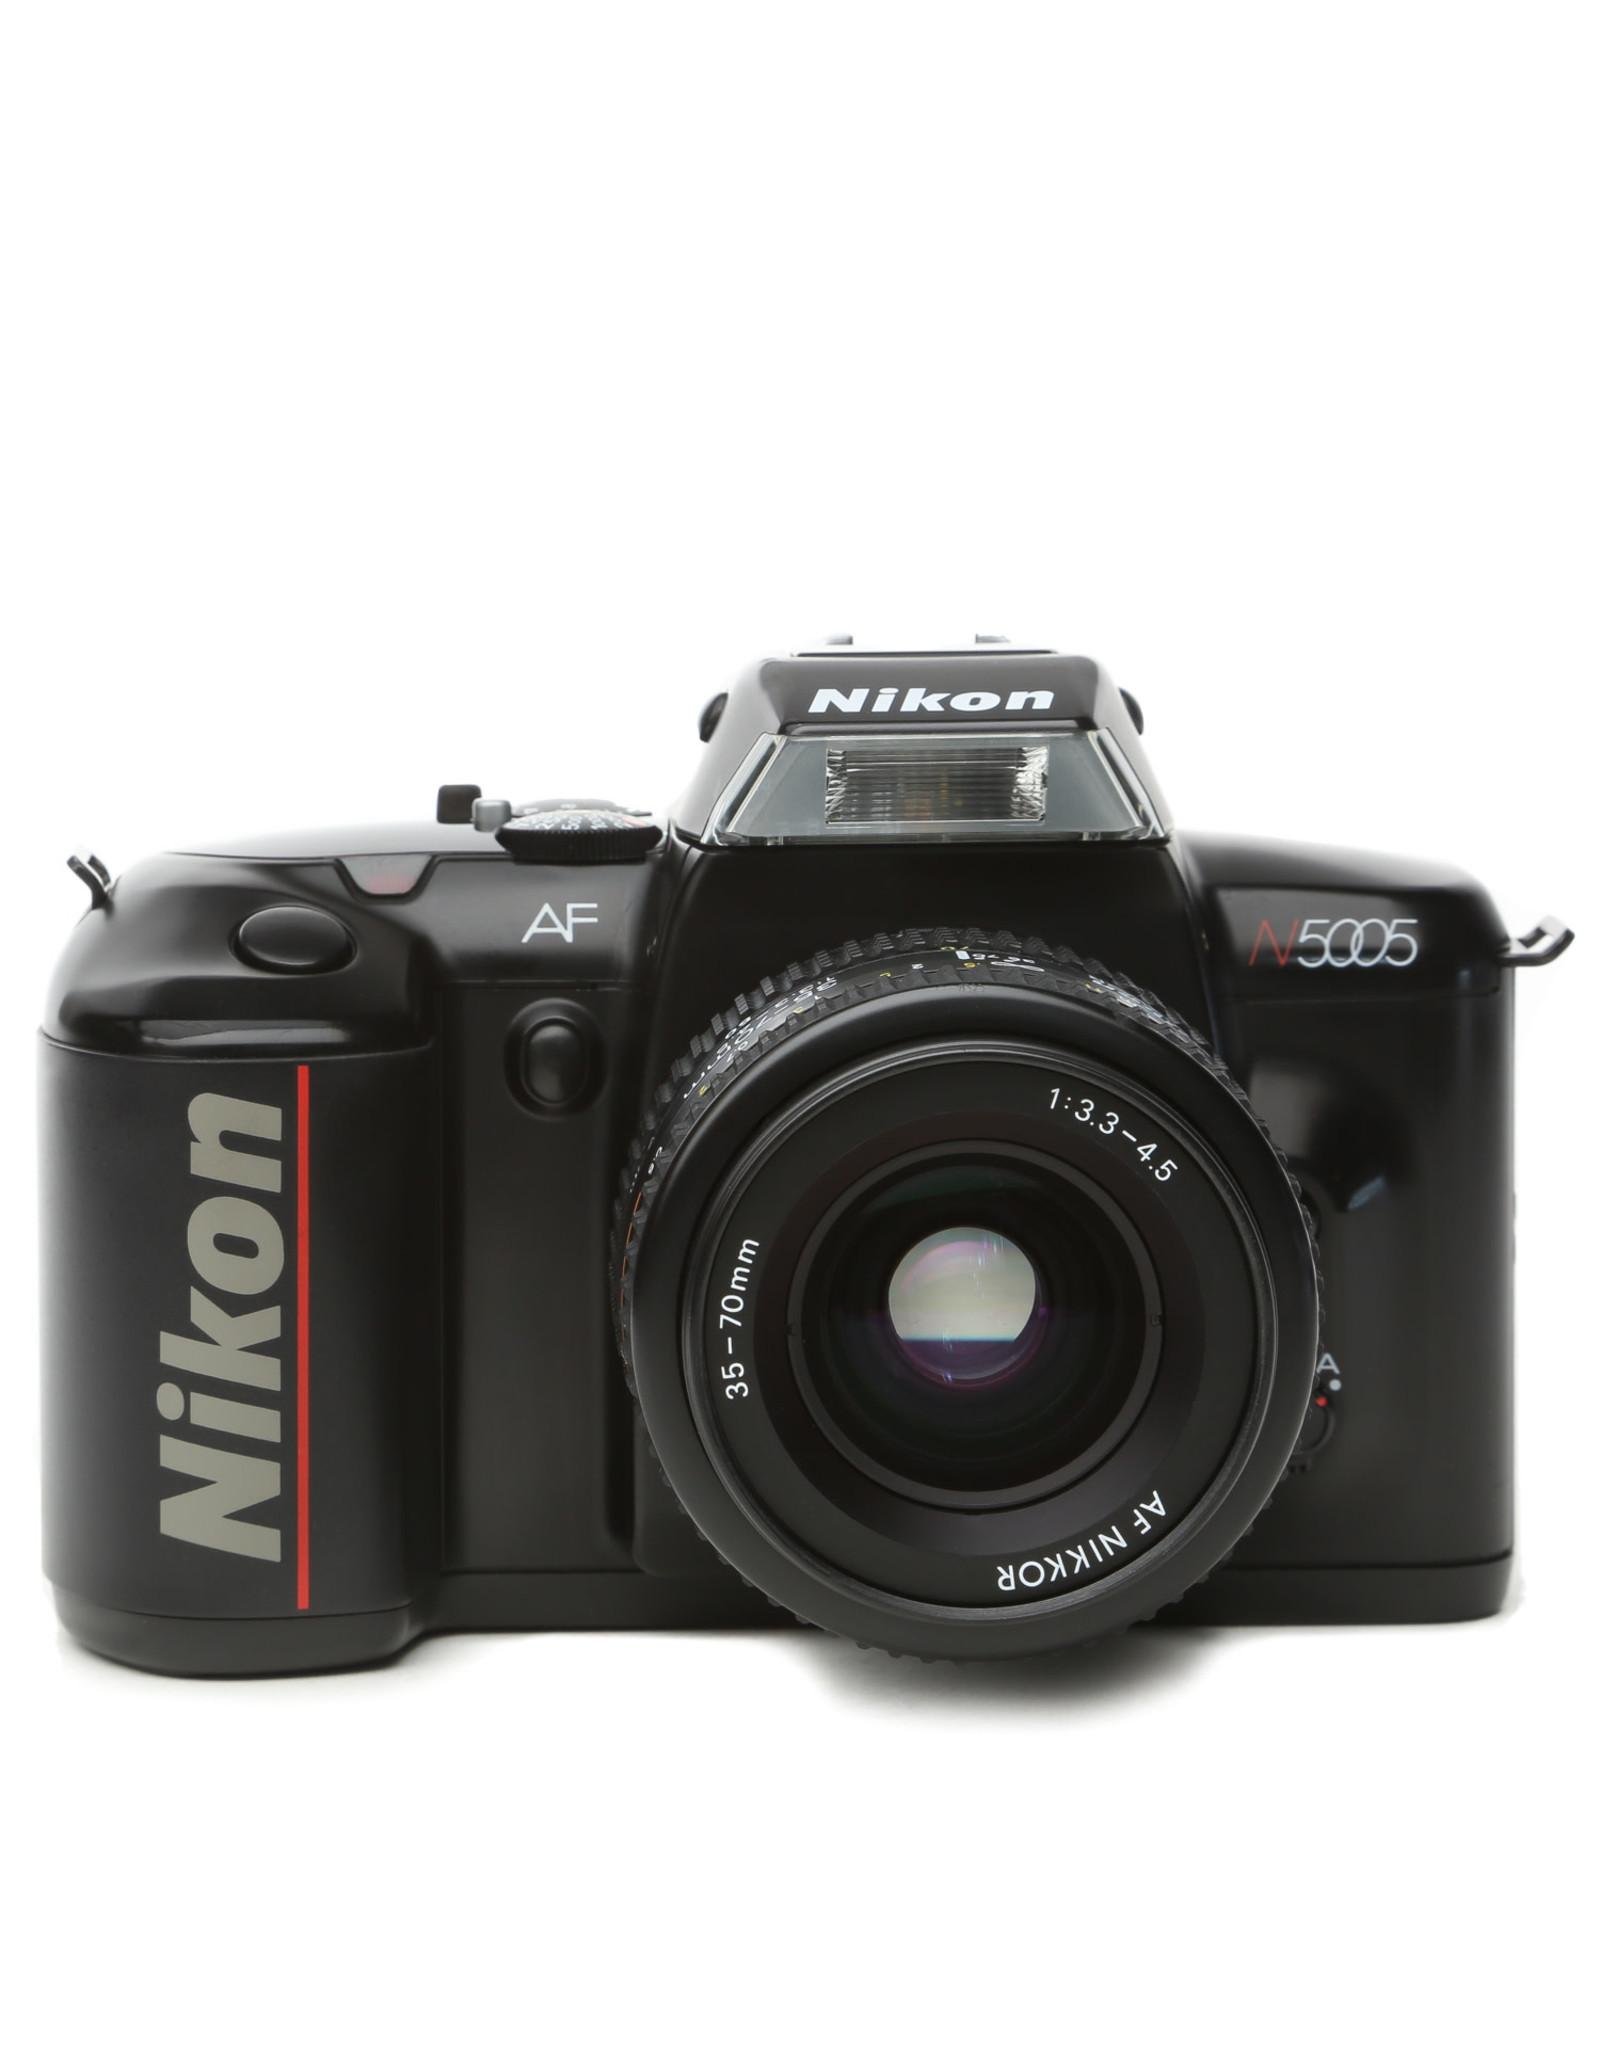 Nikon Nikon N5005 35mm SLR Camera w/35-70 Lens